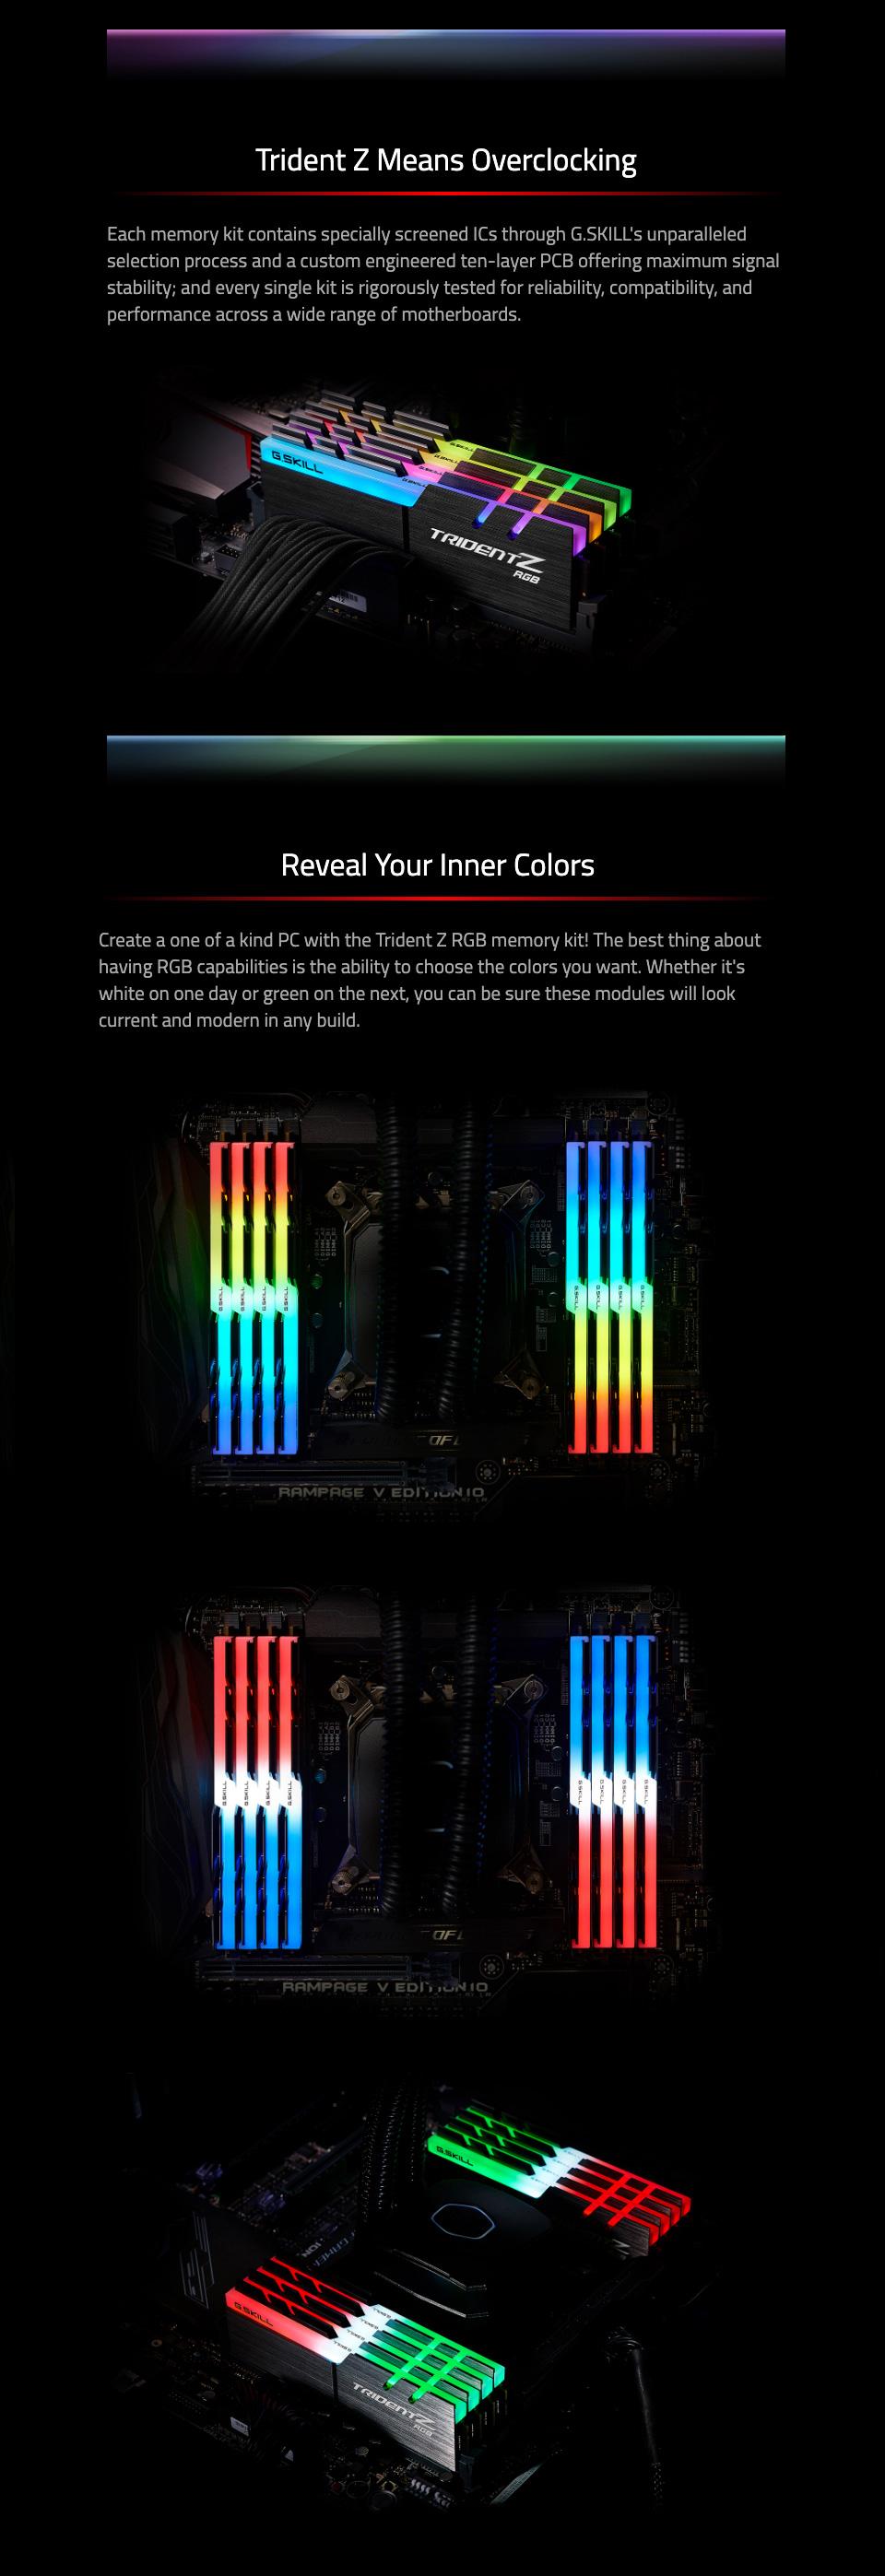 G.Skill Trident Z RGB F4-3600C18D-16GTZR 16GB (2x8GB) DDR4 features 2